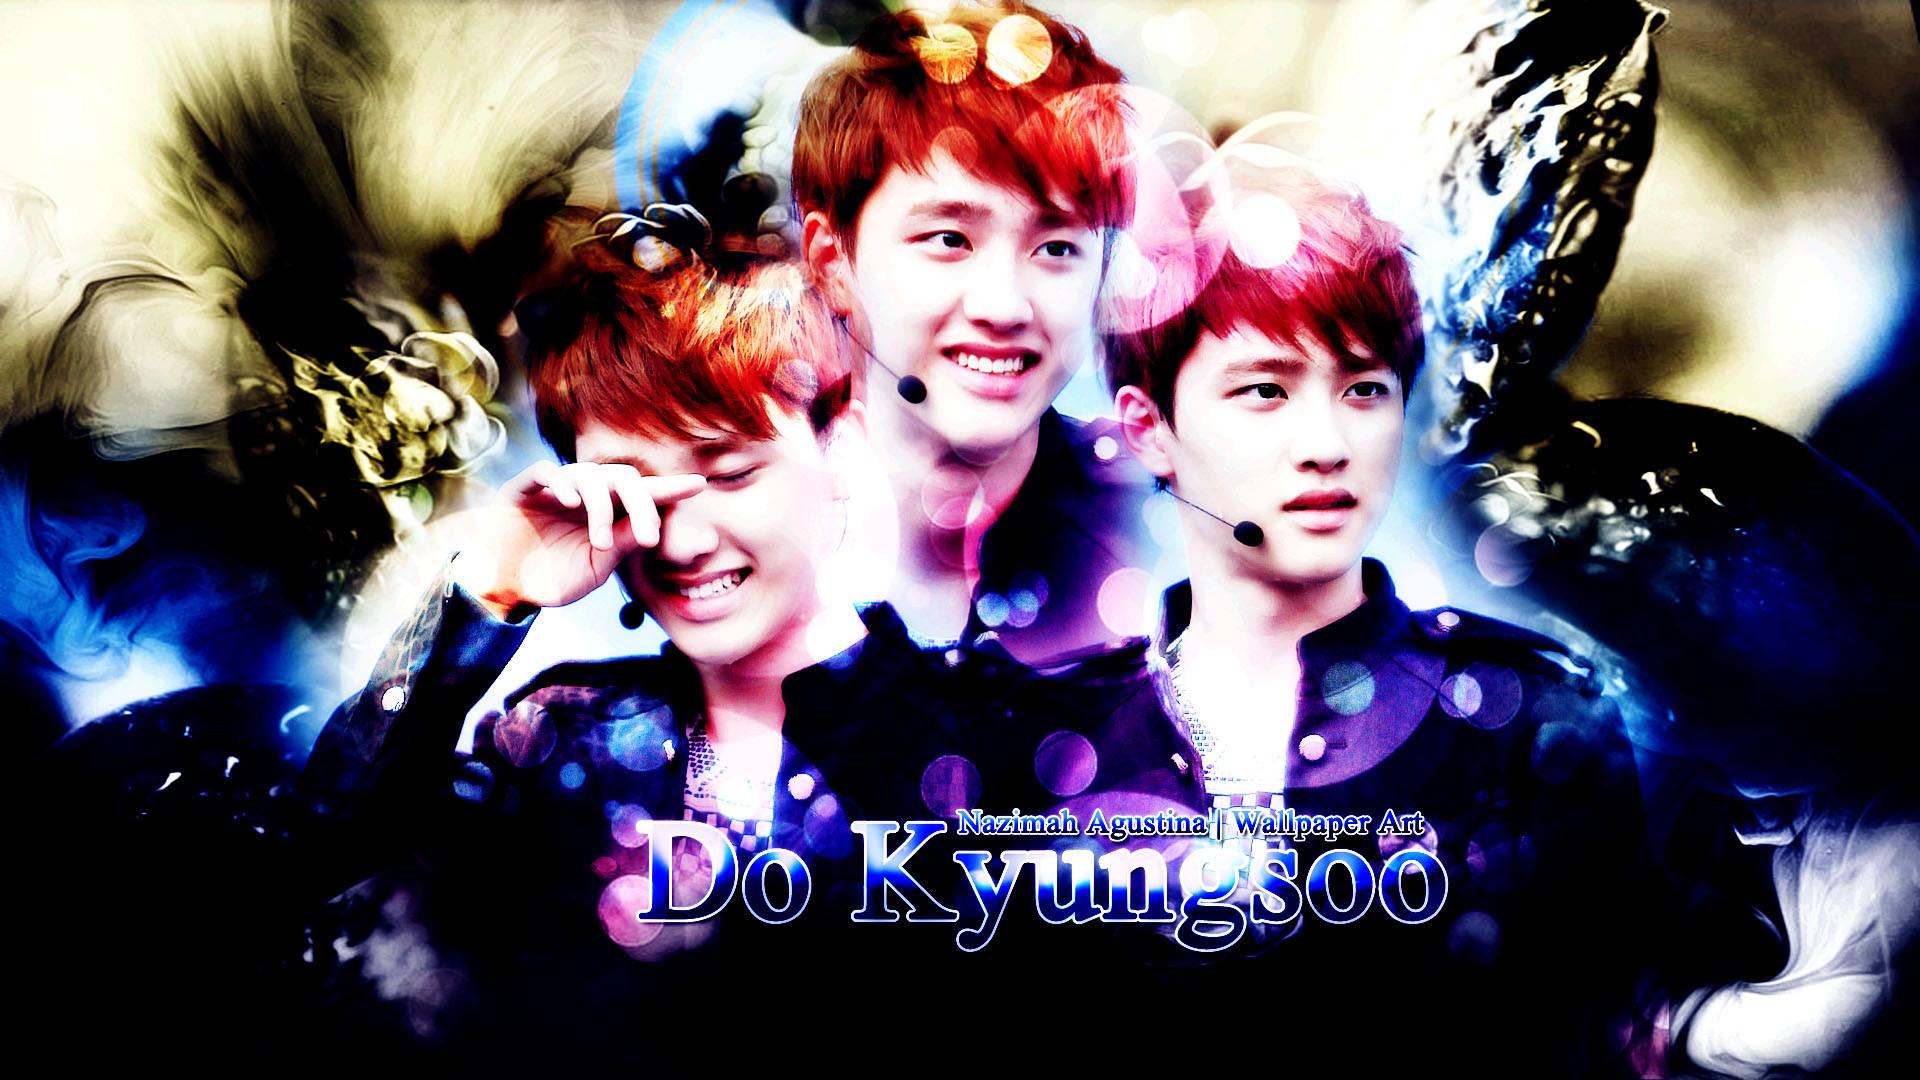 … kyungsoo do exo wallpaper brithday blue soft drama graphic by nazimah  agustina …